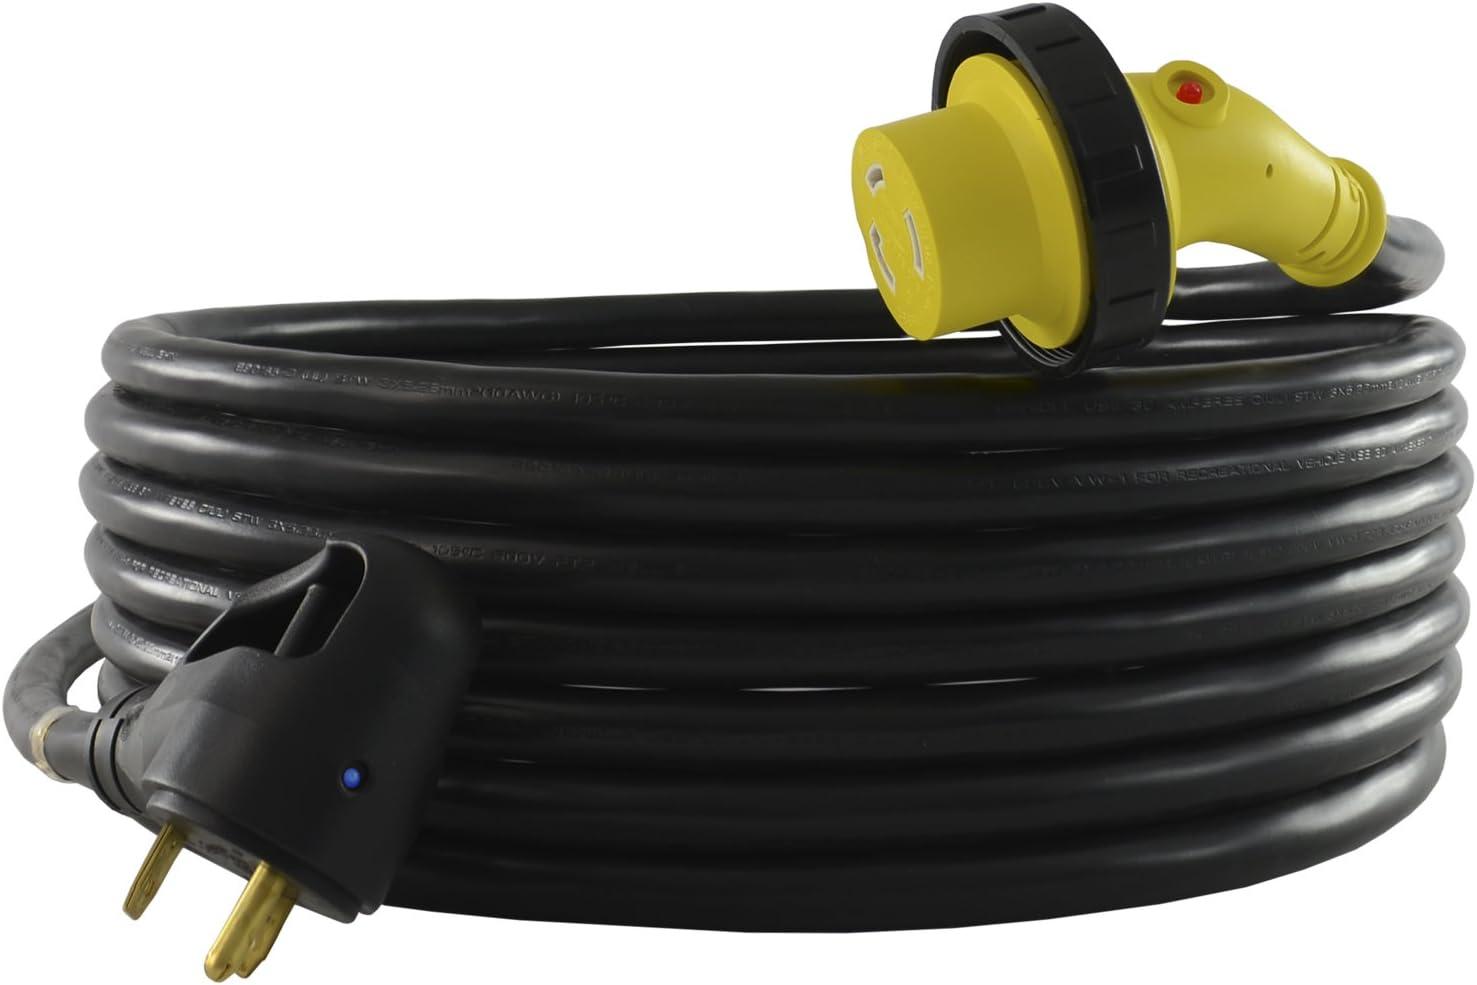 Conntek 15350-LA6 30 Amp RV Power Supply Cord, UL Listed 50 Feet